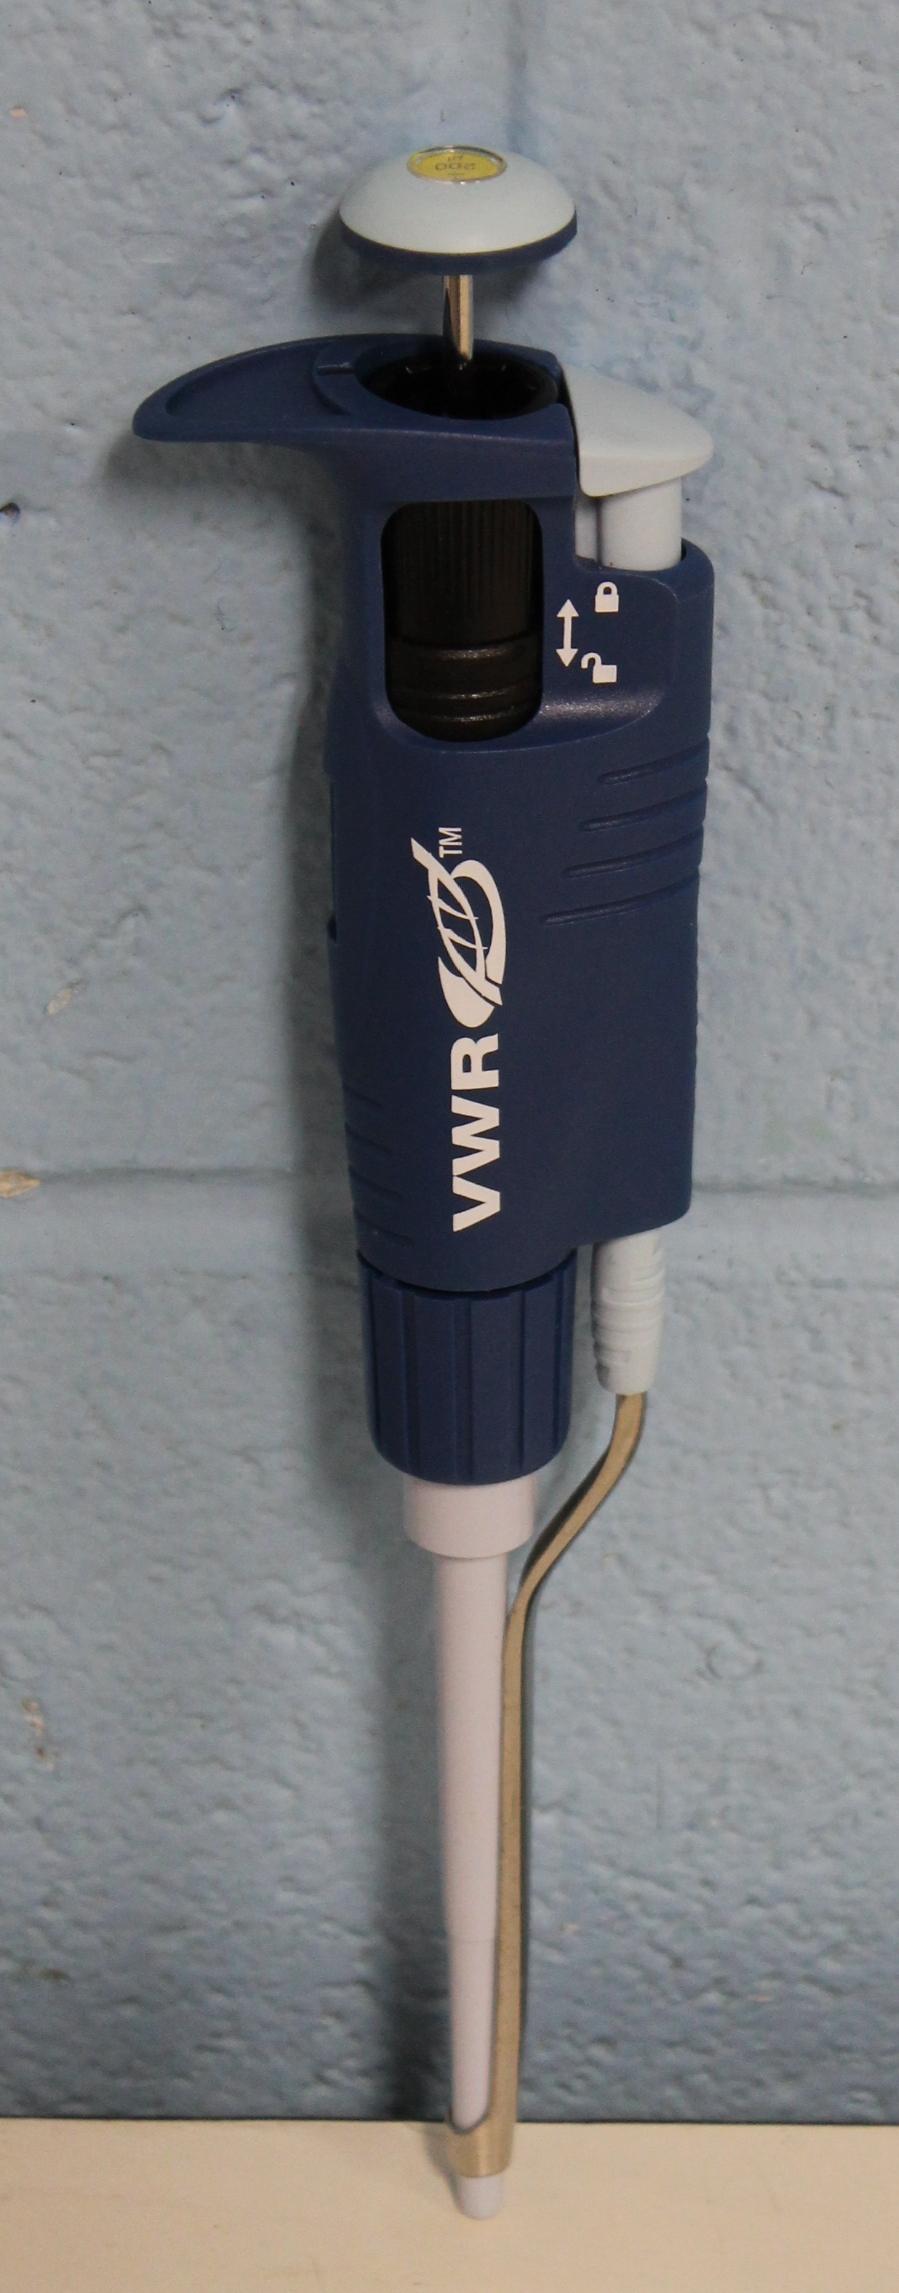 VWR 20 - 200 uL Signature Ergonomic High Performance Single-Channel Variable Volume Pipettor Image